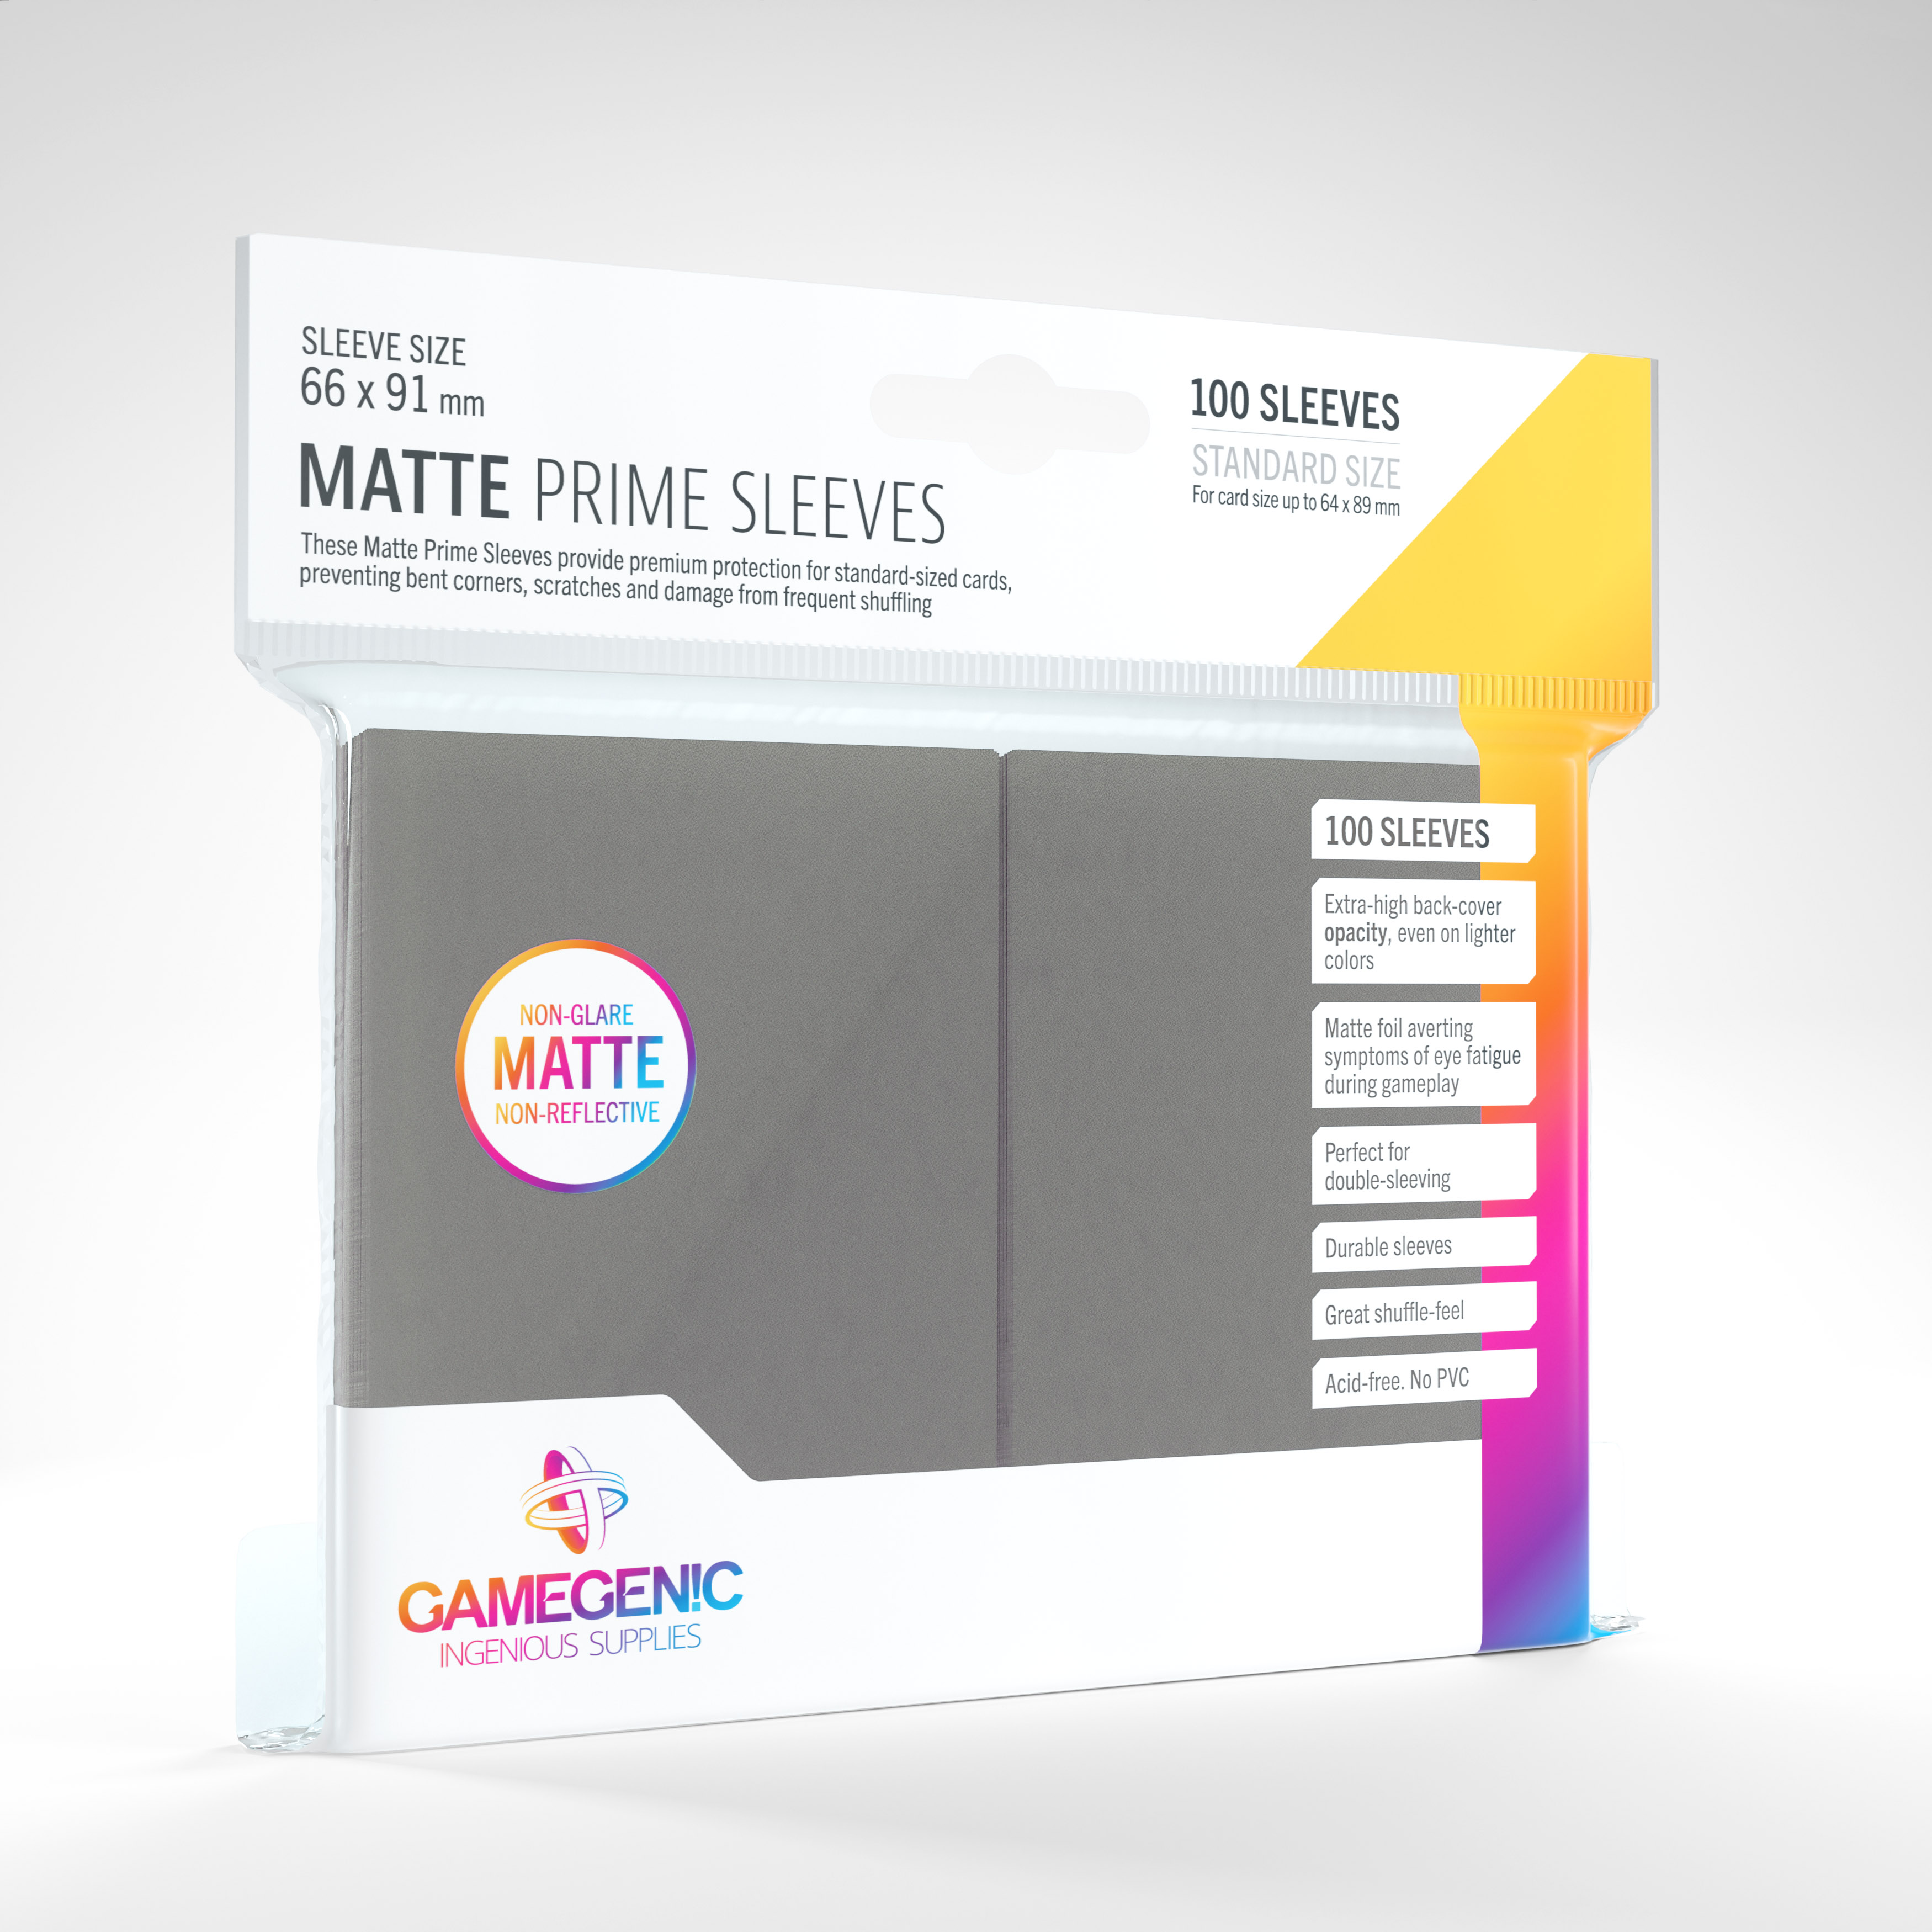 Gamegenic - Sleeves: Gamegenic Matte Prime Sleeves - Dark gray (100)